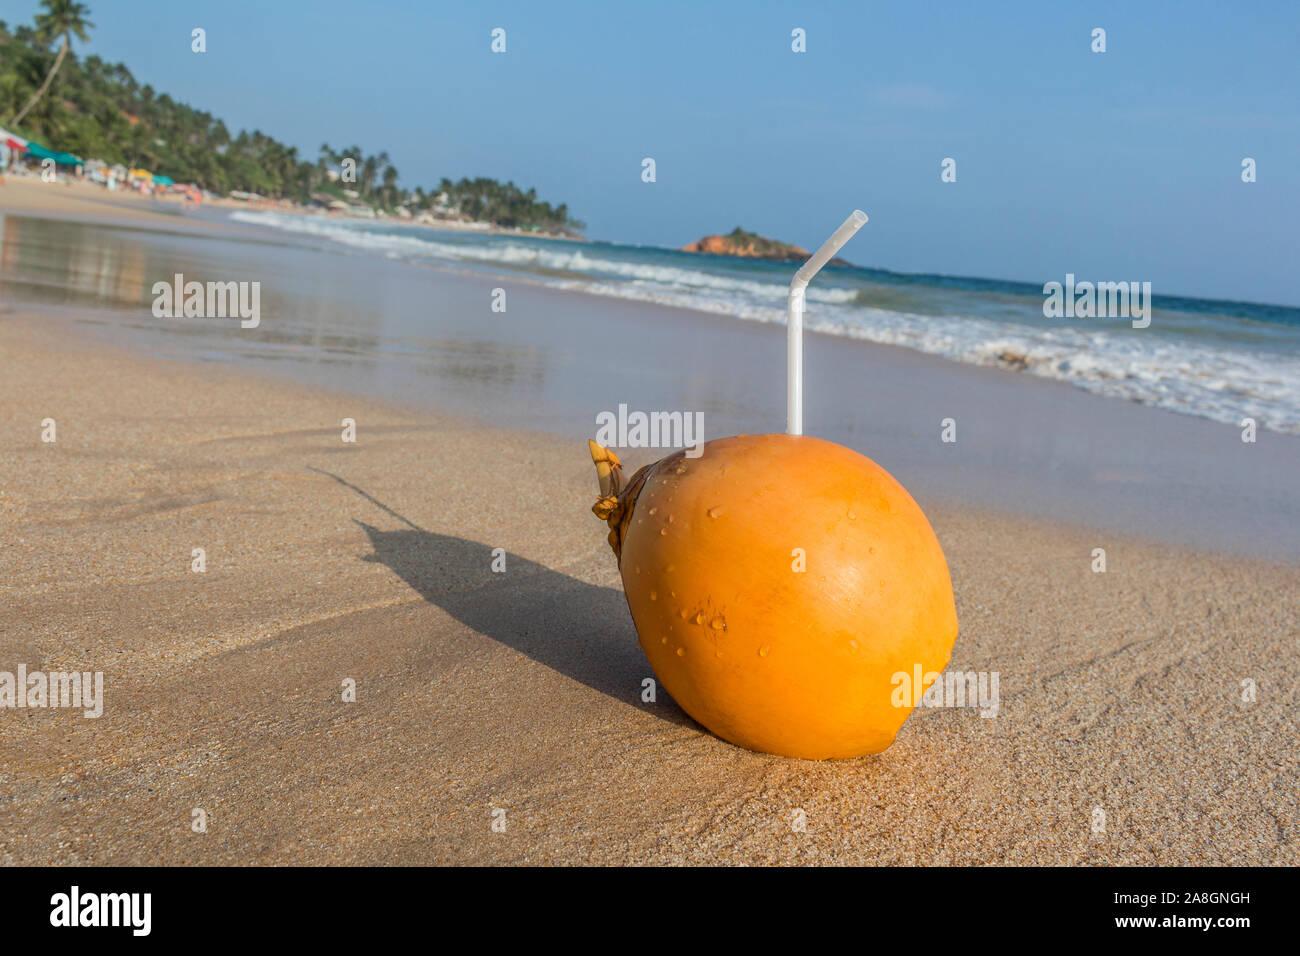 Coconut with drinking straw. Mirissa Beach in beautiful Island Sri Lanka. Stock Photo